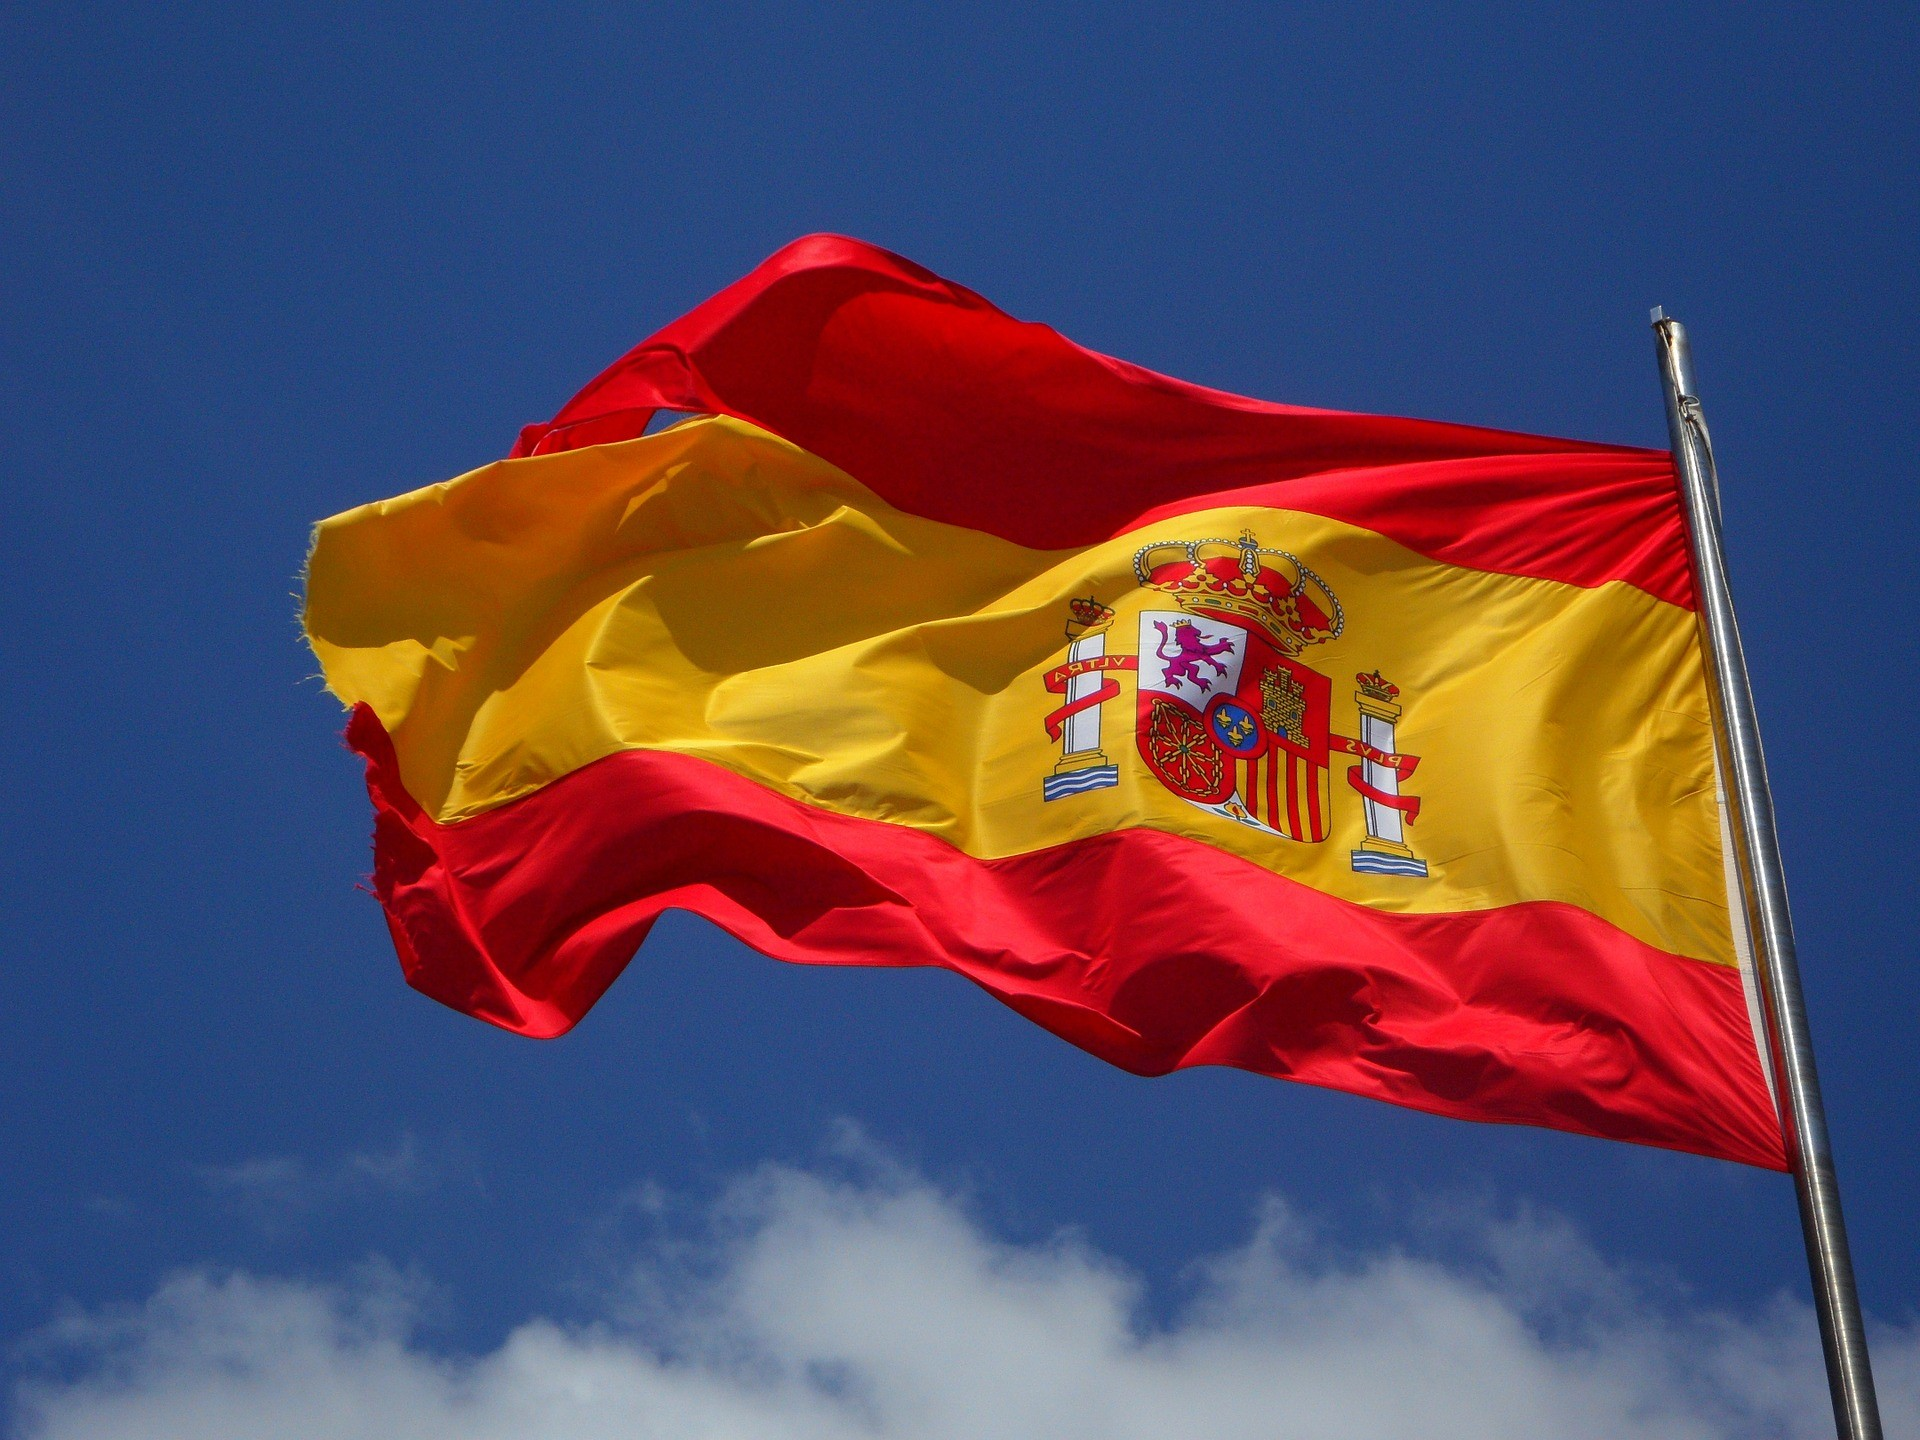 2017 Spanish property market gems – Kyero.com gazes into the crystal ball